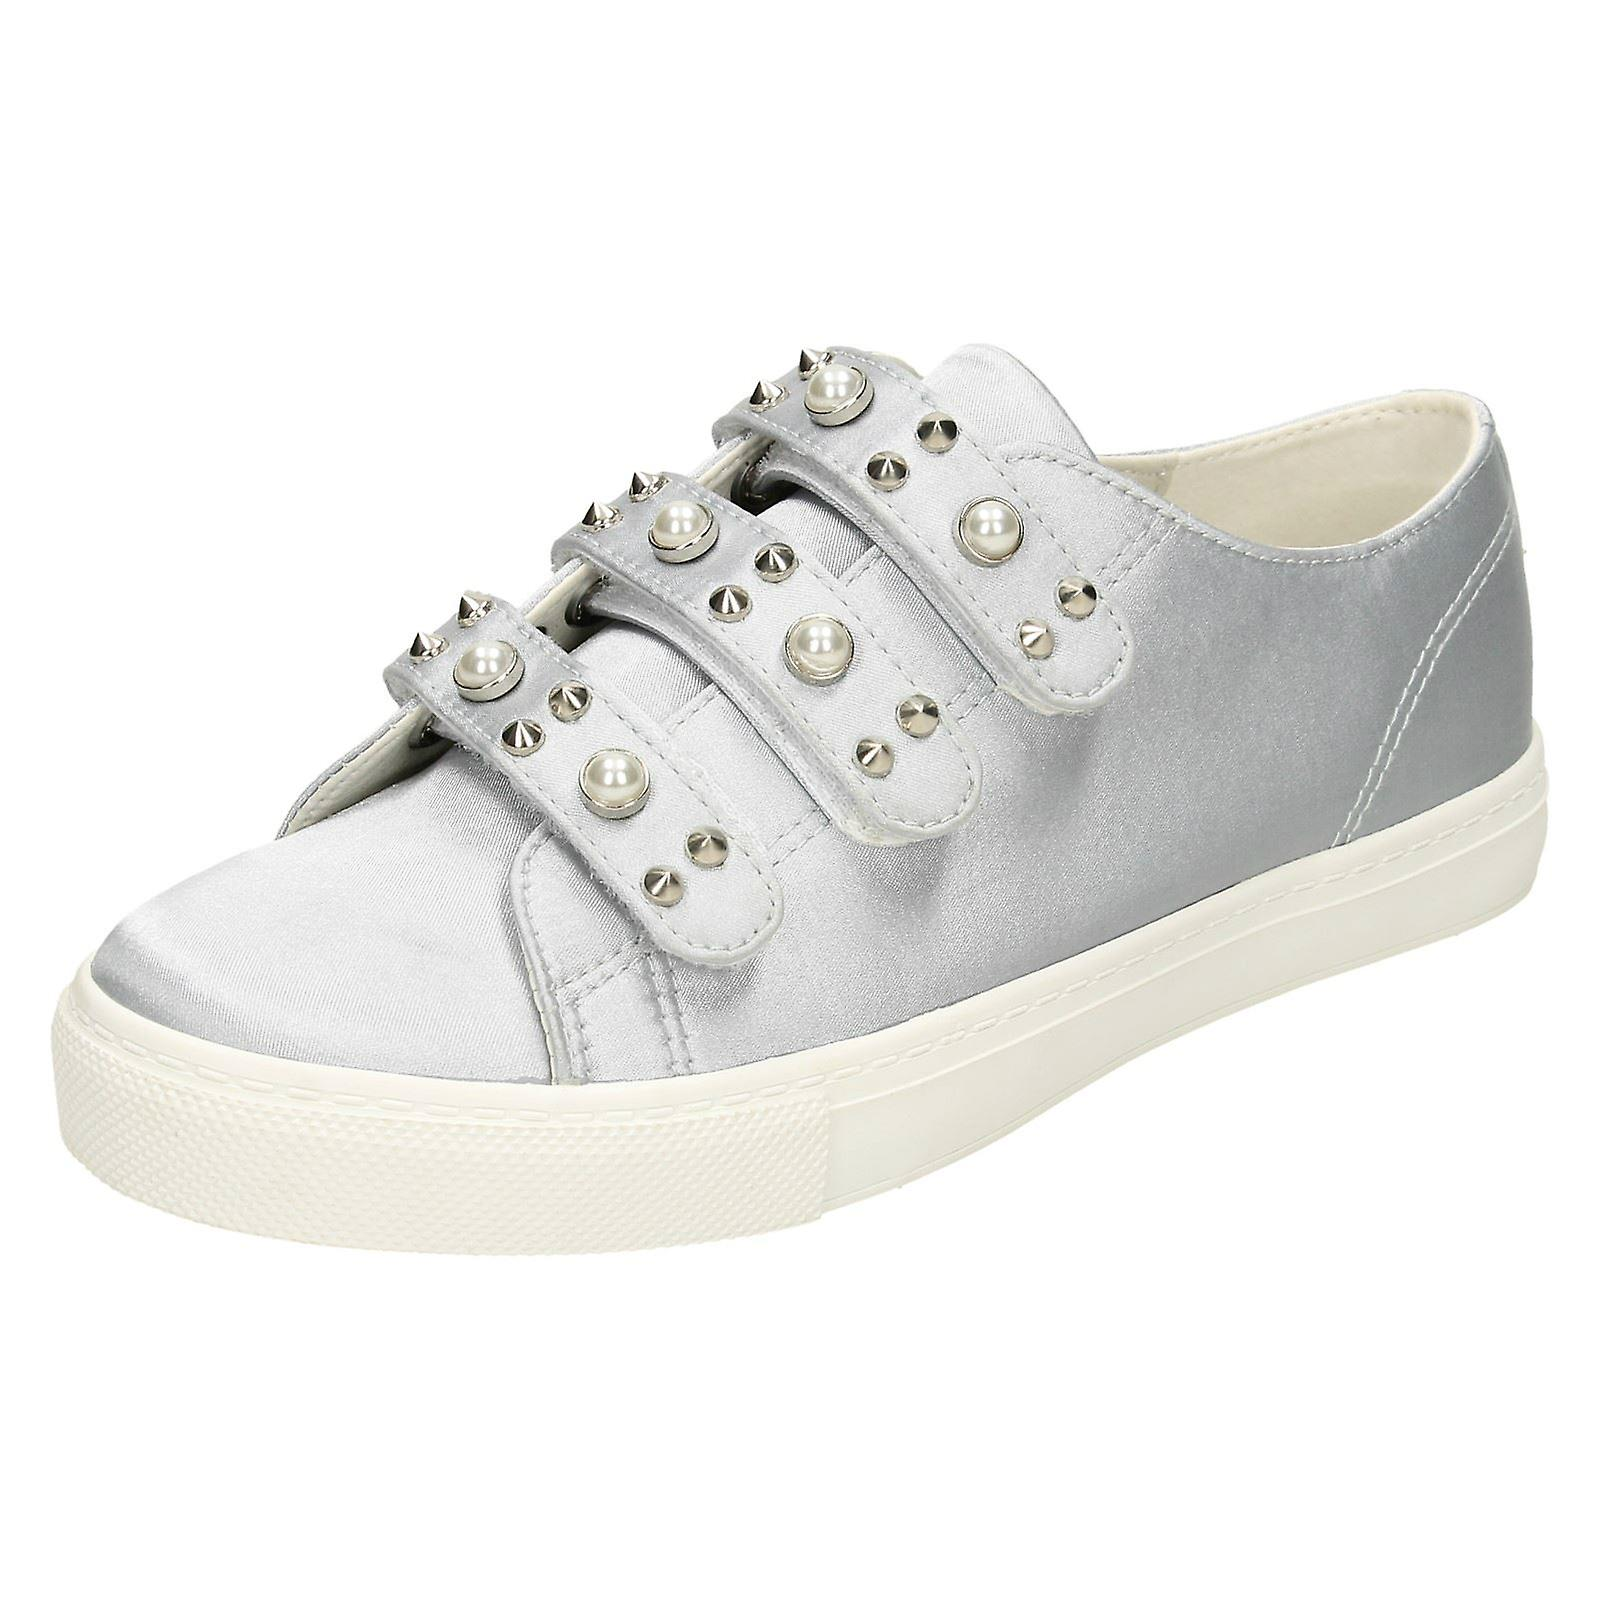 Damen-Fleck auf Perle Armband Schuhe F80359 - grau Satin - UK Größe 3 - EU Größe 36 - Größe 5